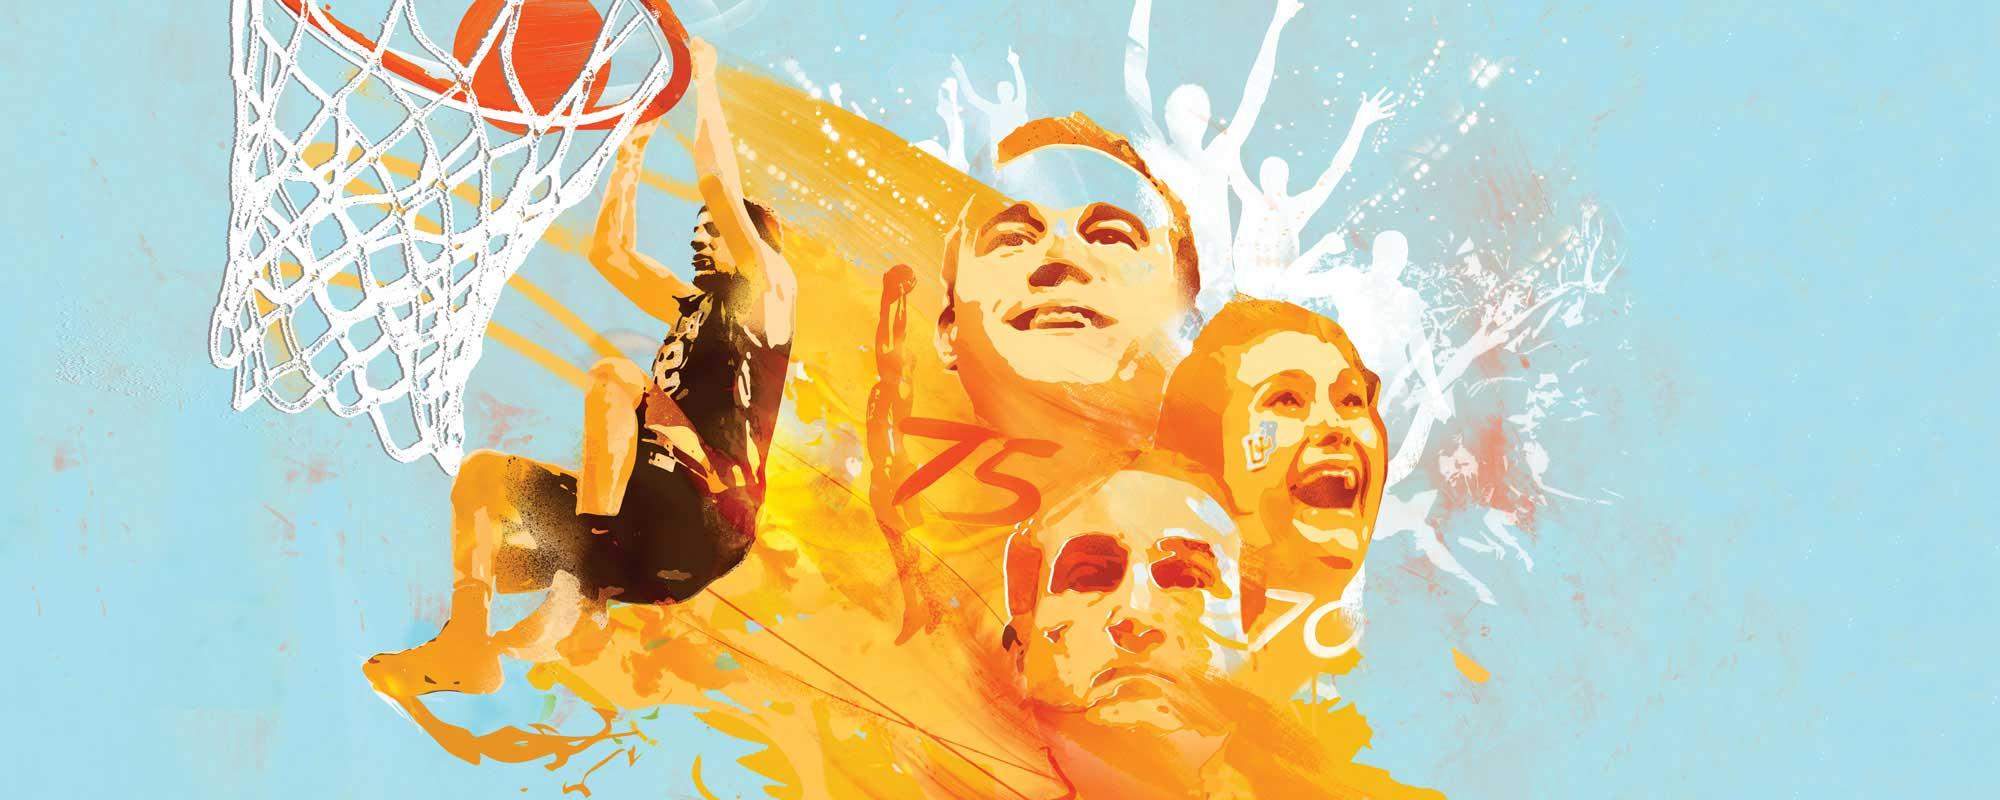 Illustration of Gabe Knutson dunking basketball